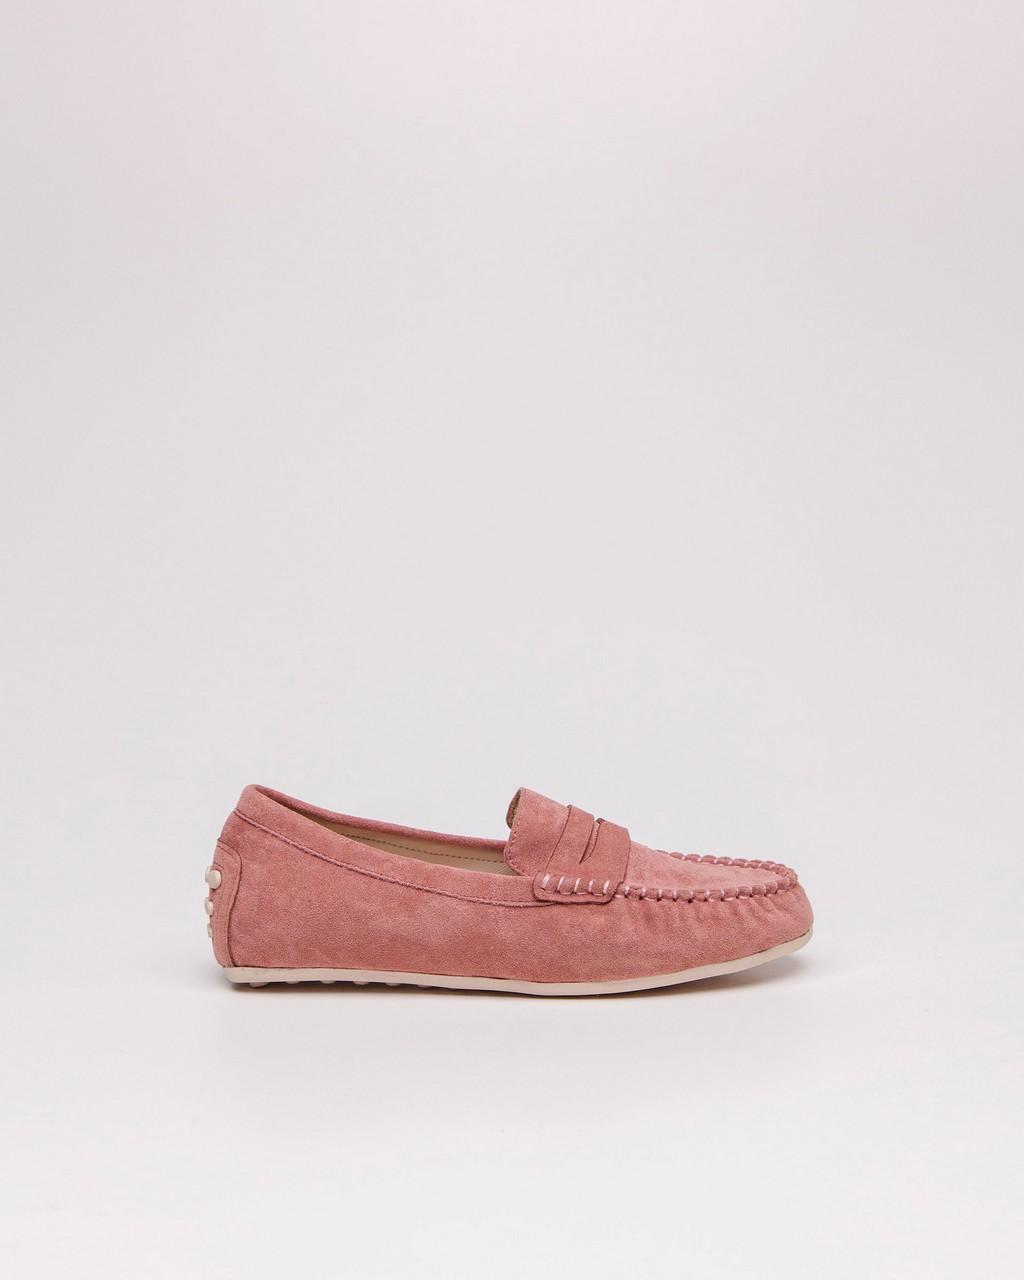 Tagtraume Bottle - Pink(핑크)